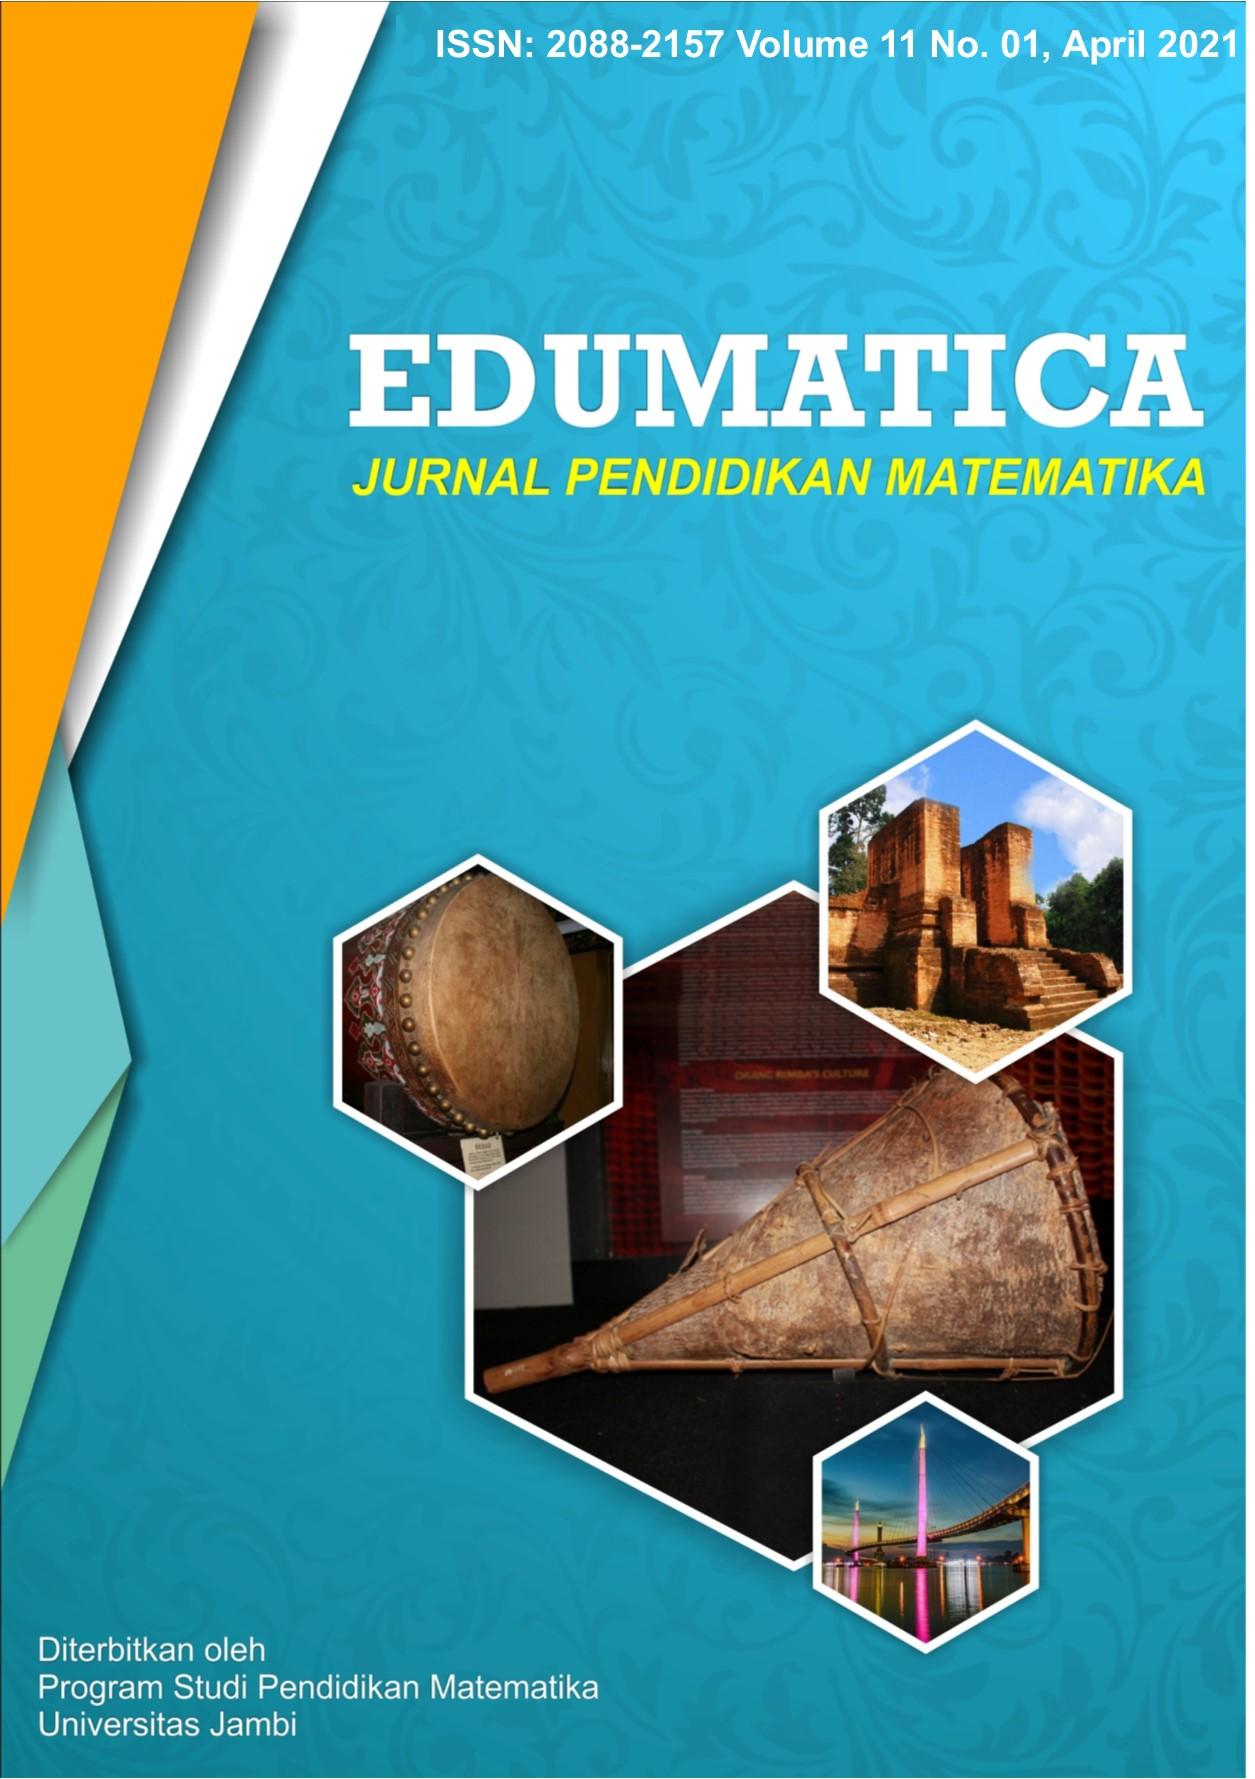 View Vol. 11 No. 01 (2021): Edumatica: Jurnal Pendidikan Matematika